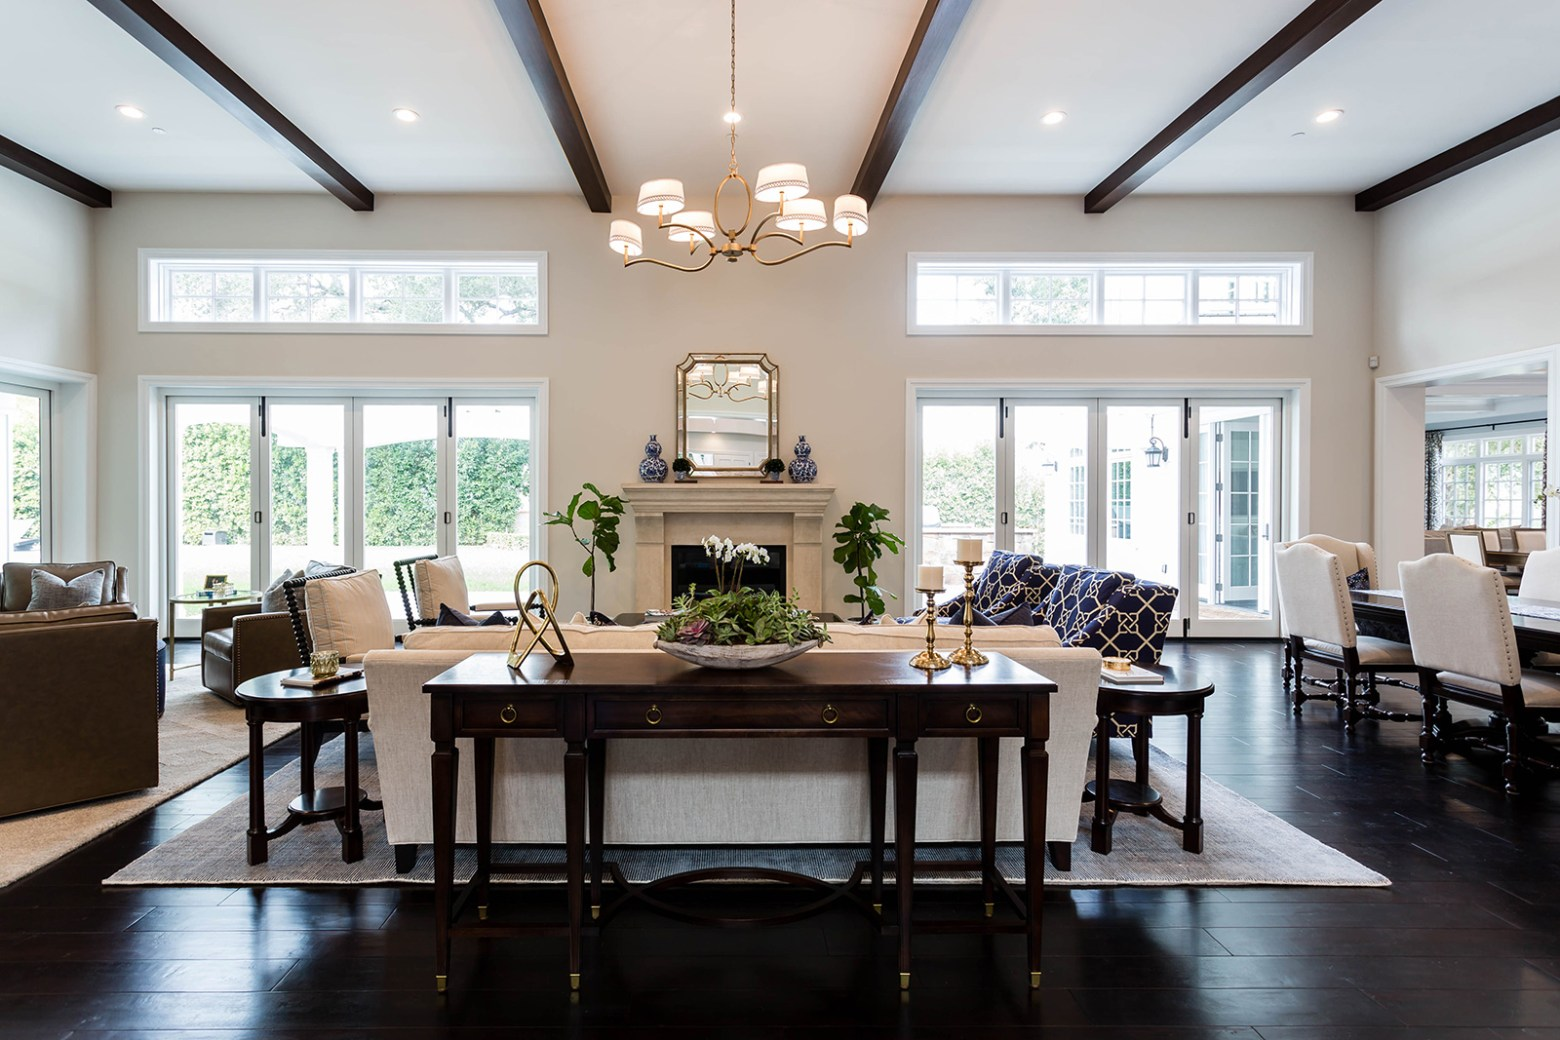 Interior designer Courtney Thomas